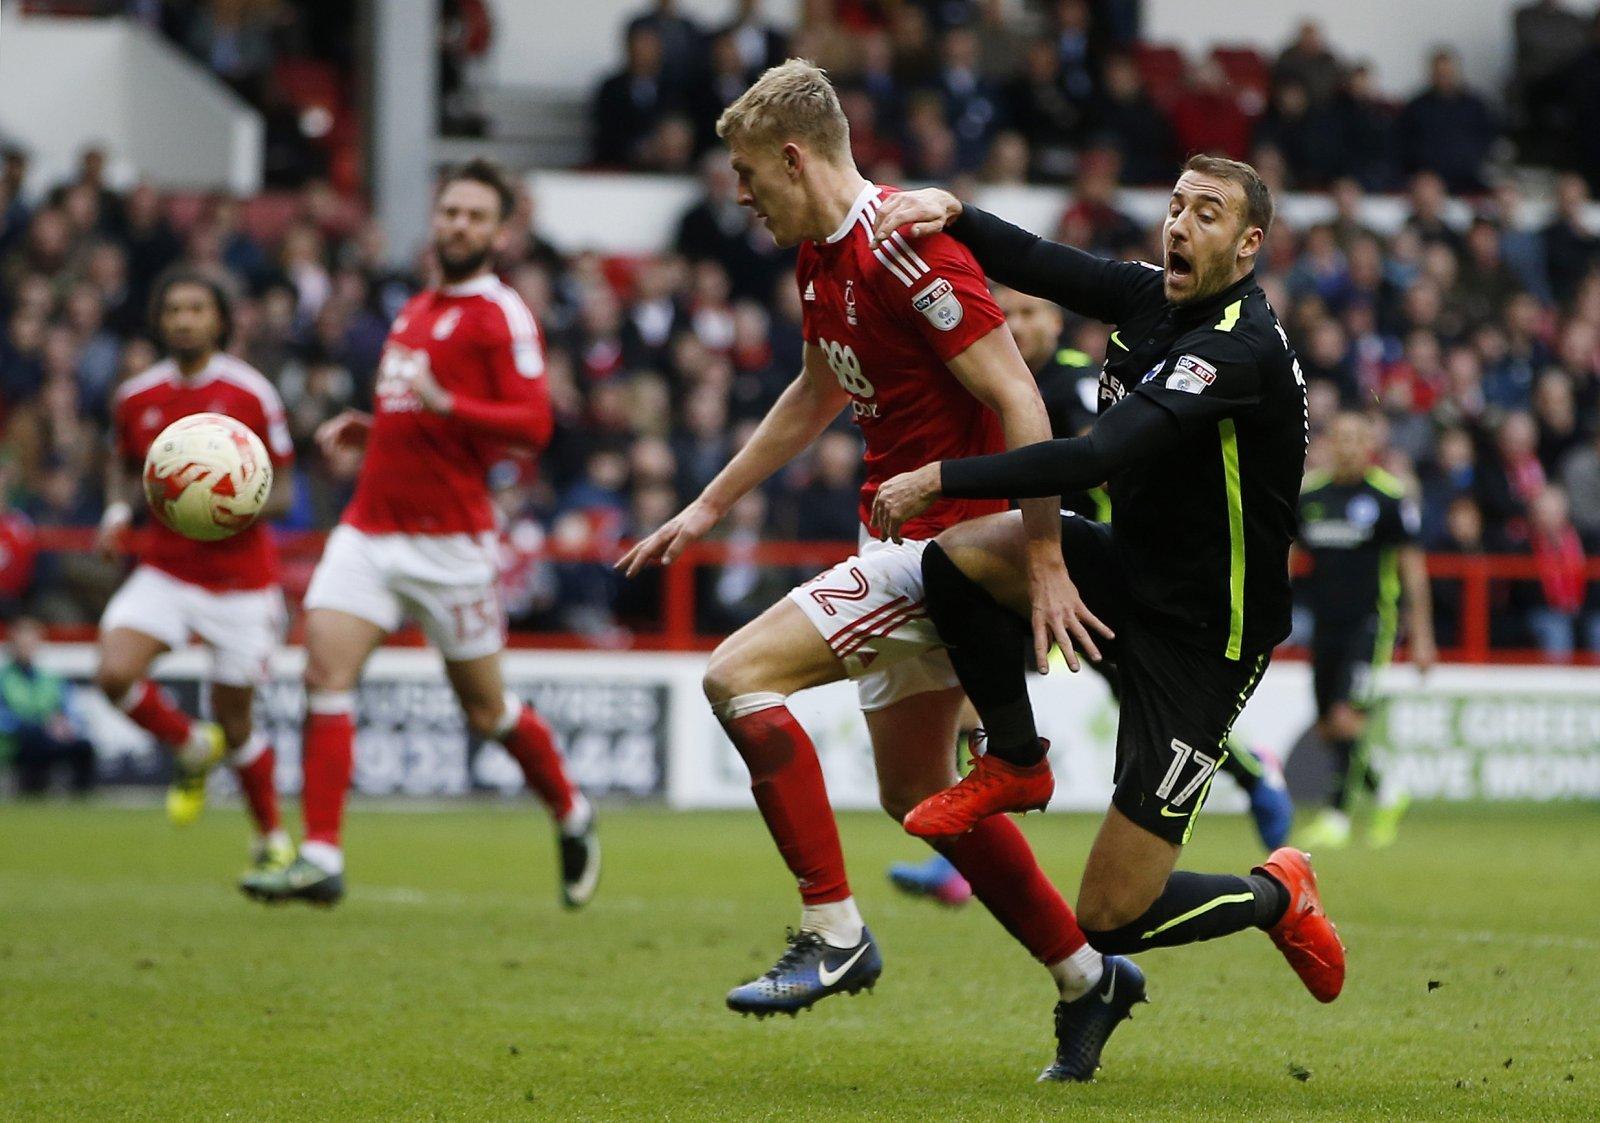 Joe Worrall in action for Nottingham Forest